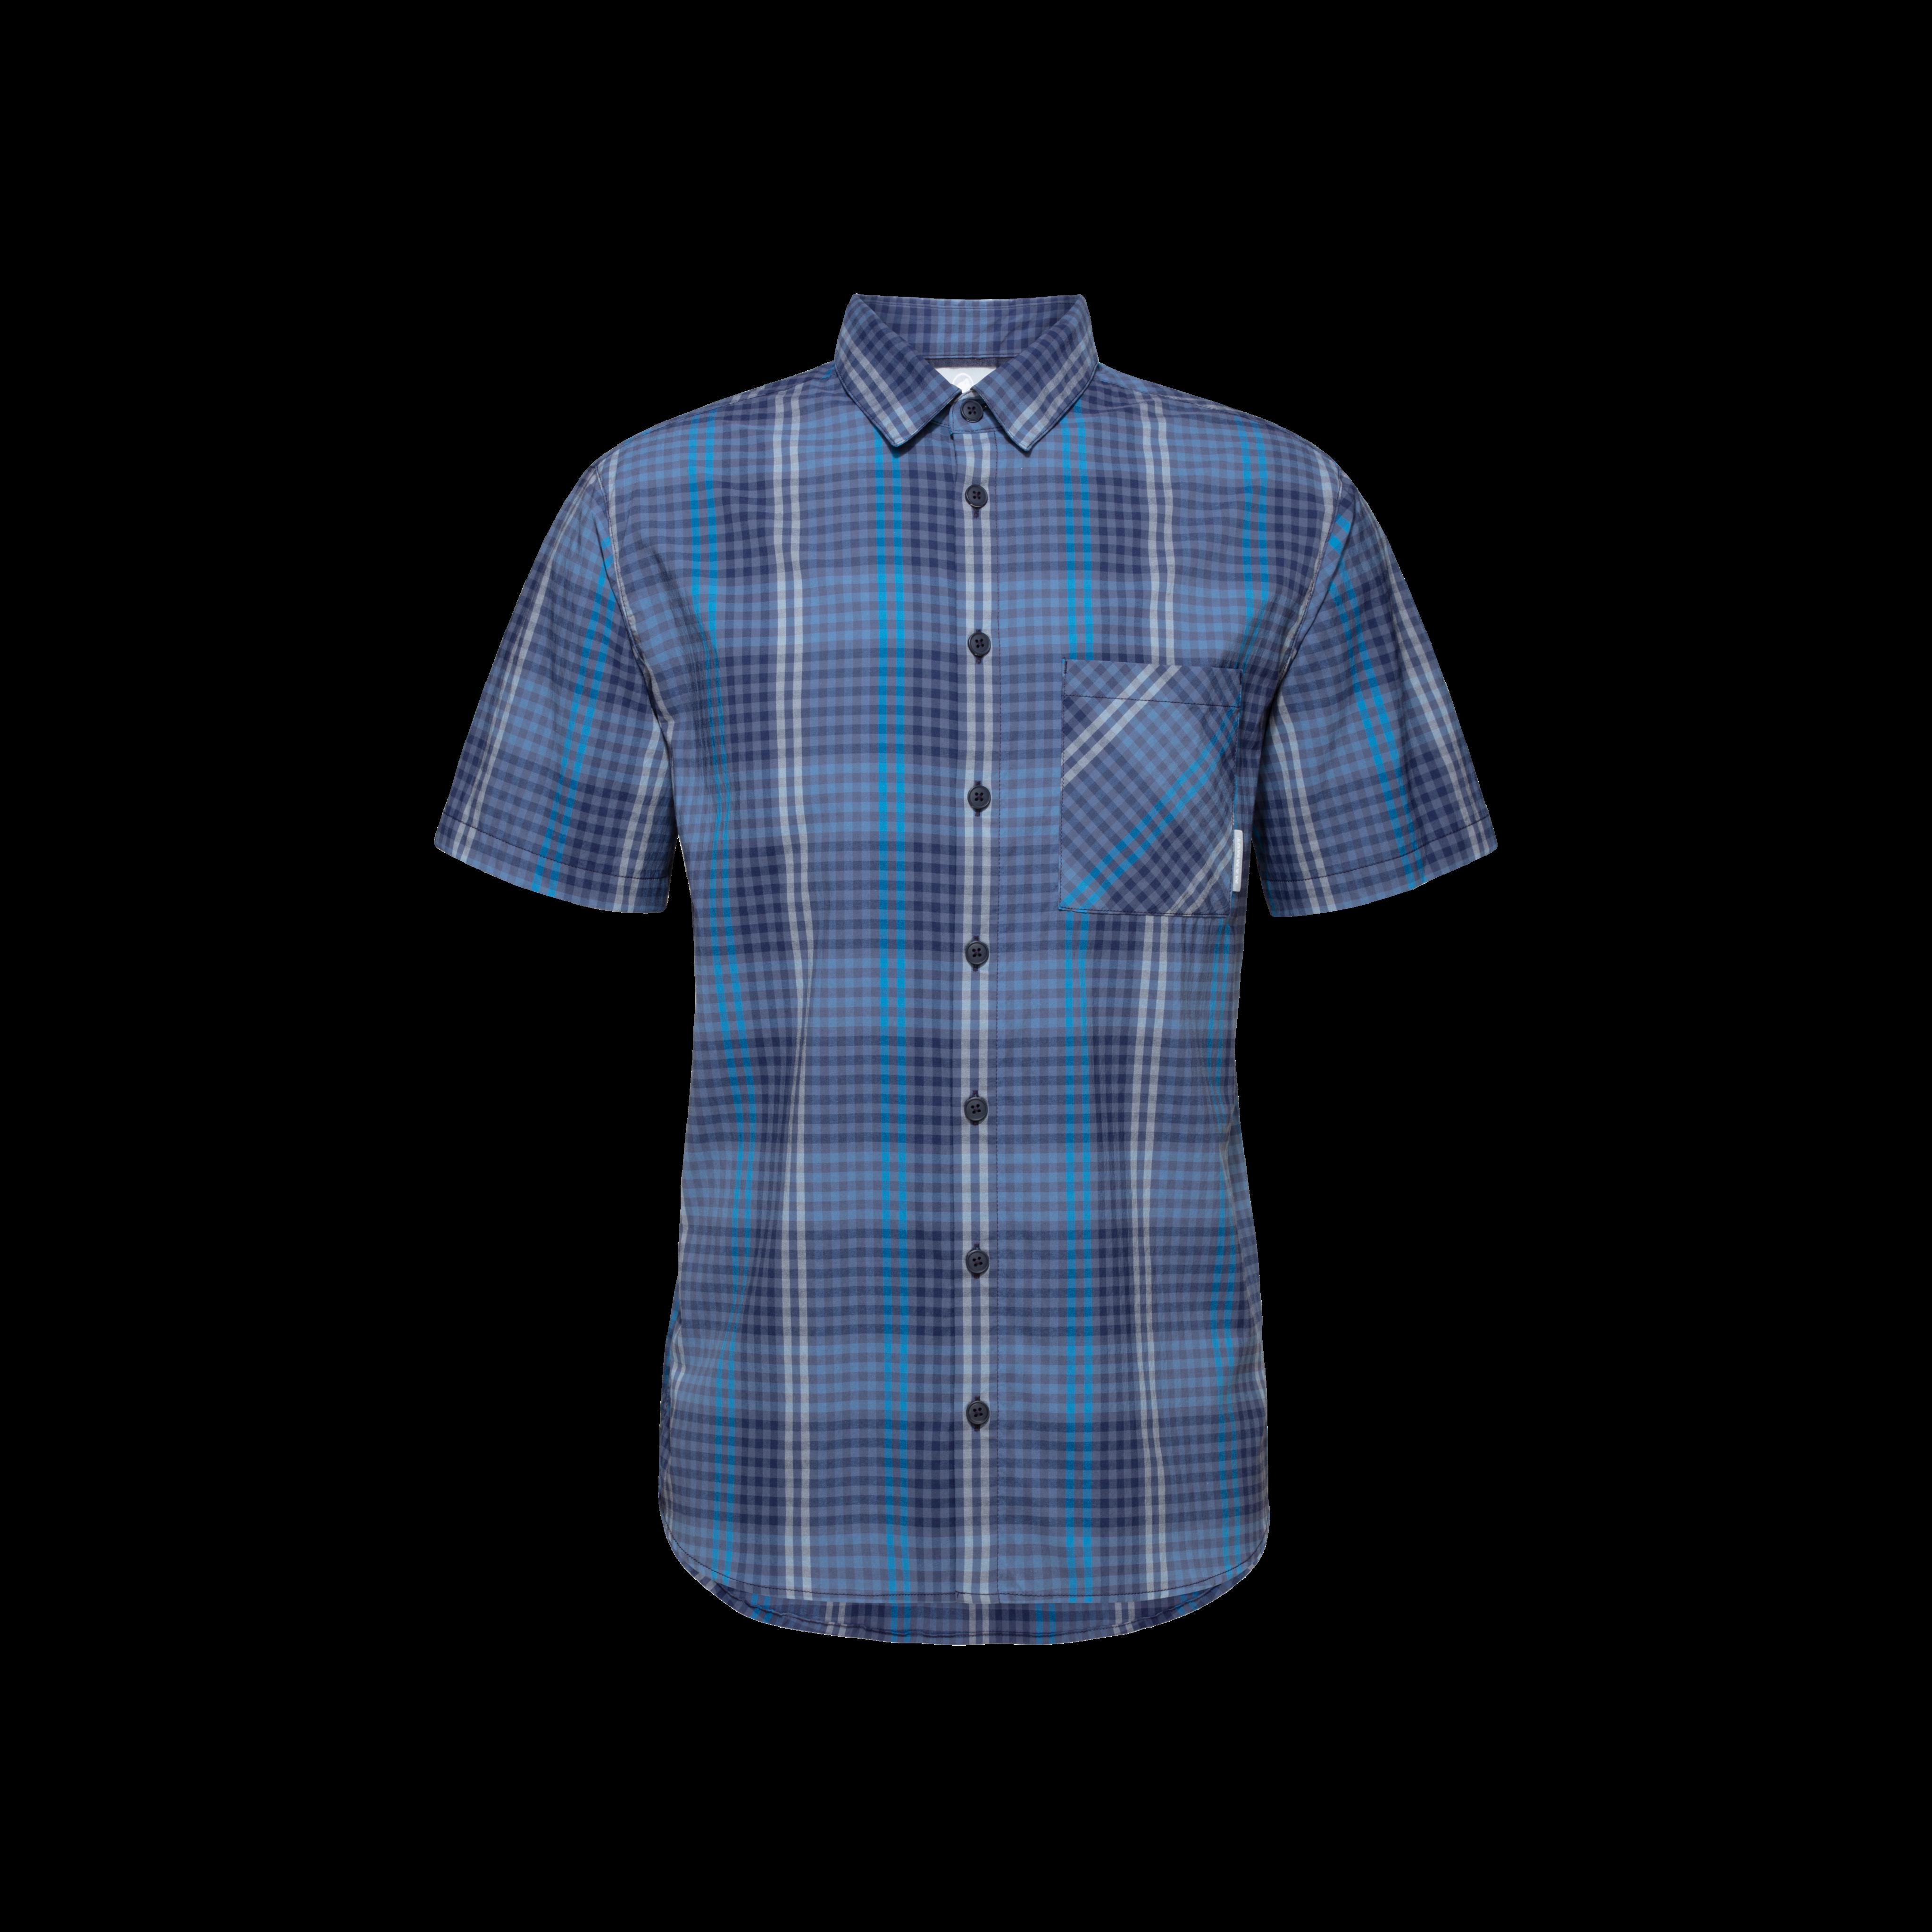 Calanca Shirt Men - L, peacoat-horizon thumbnail